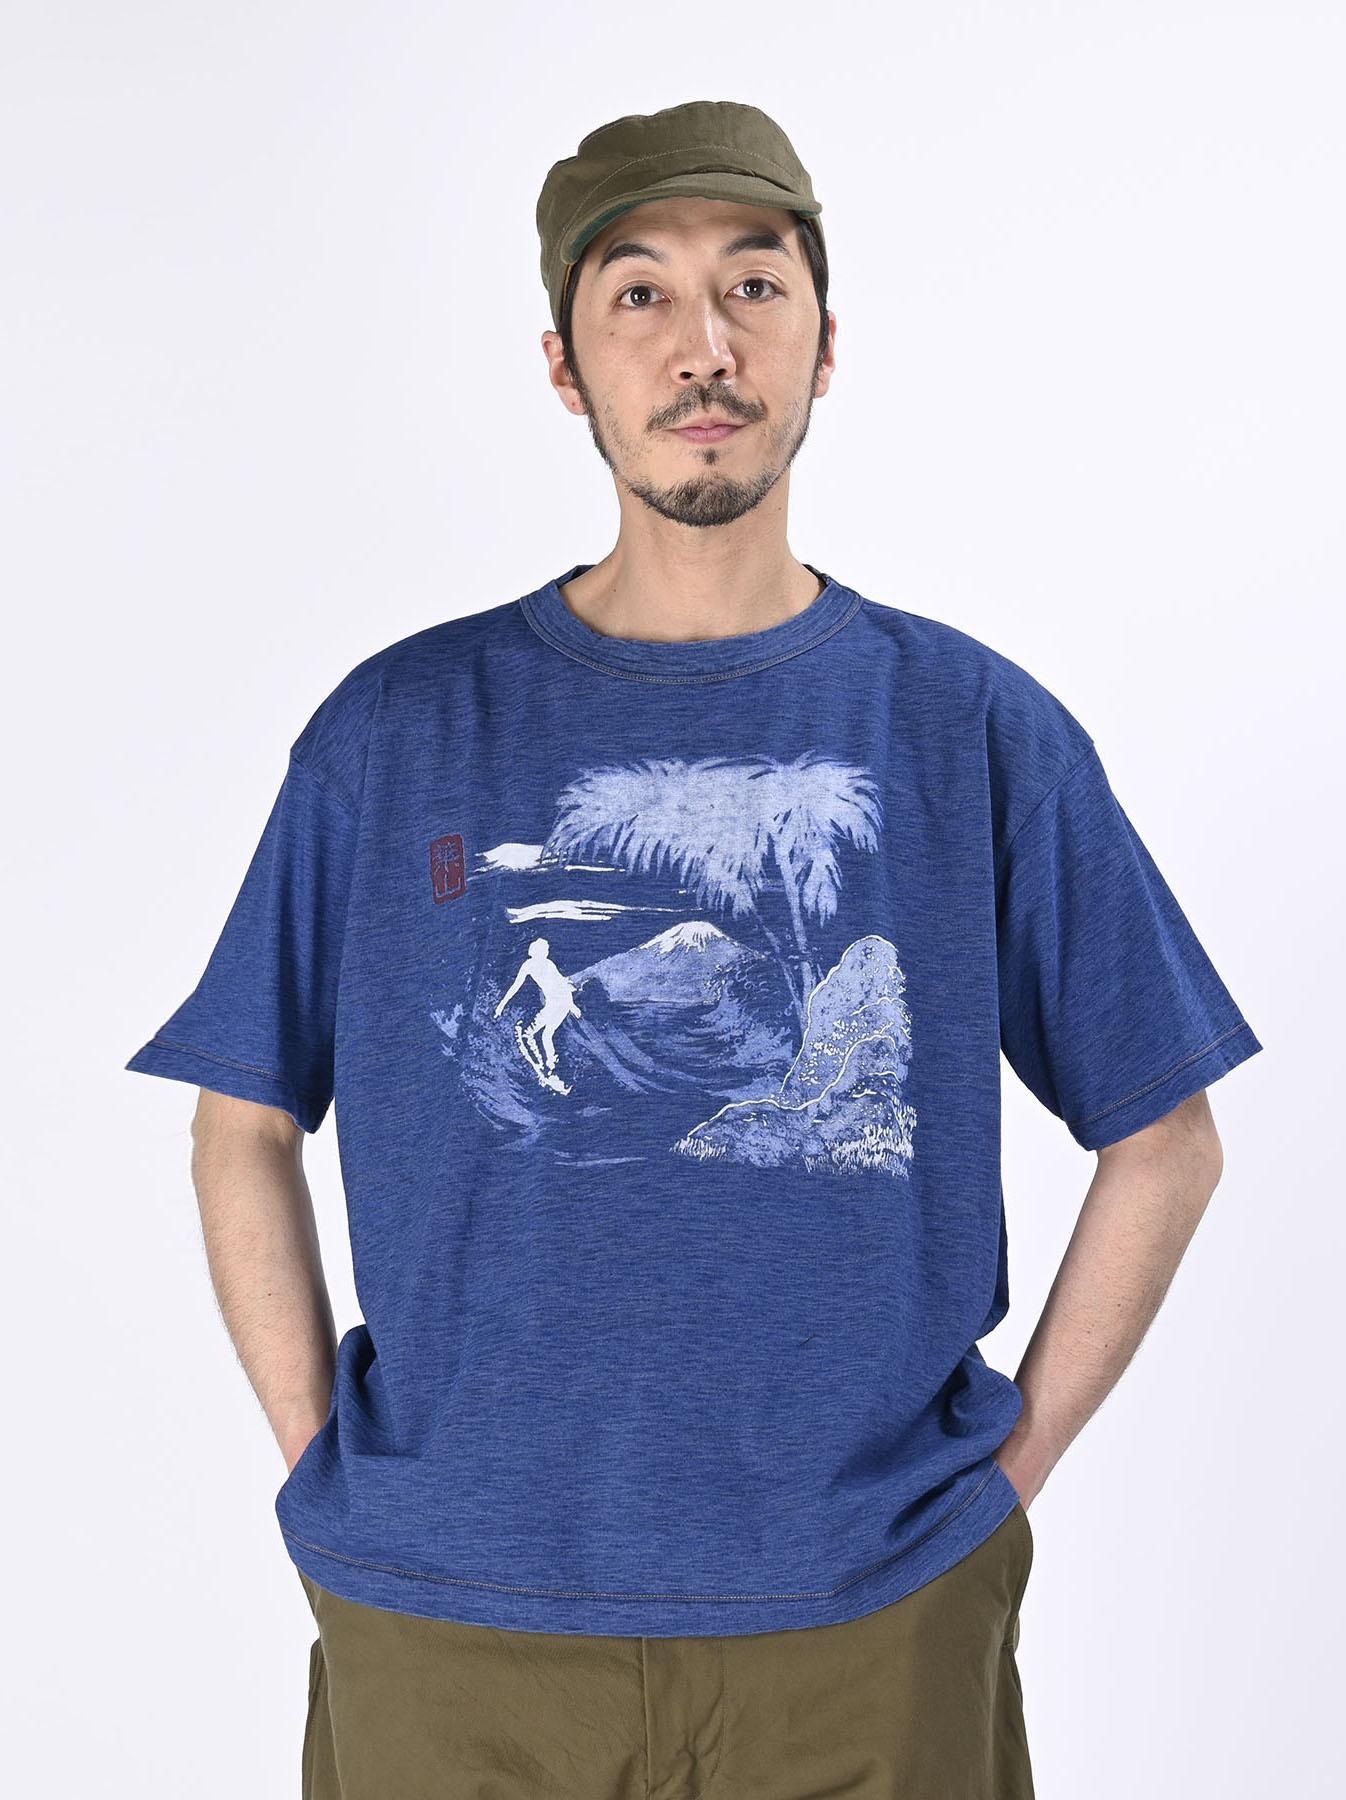 Distressed Indigo Ukiyo de Surf 908 Ocean T-shirt (0621)-3